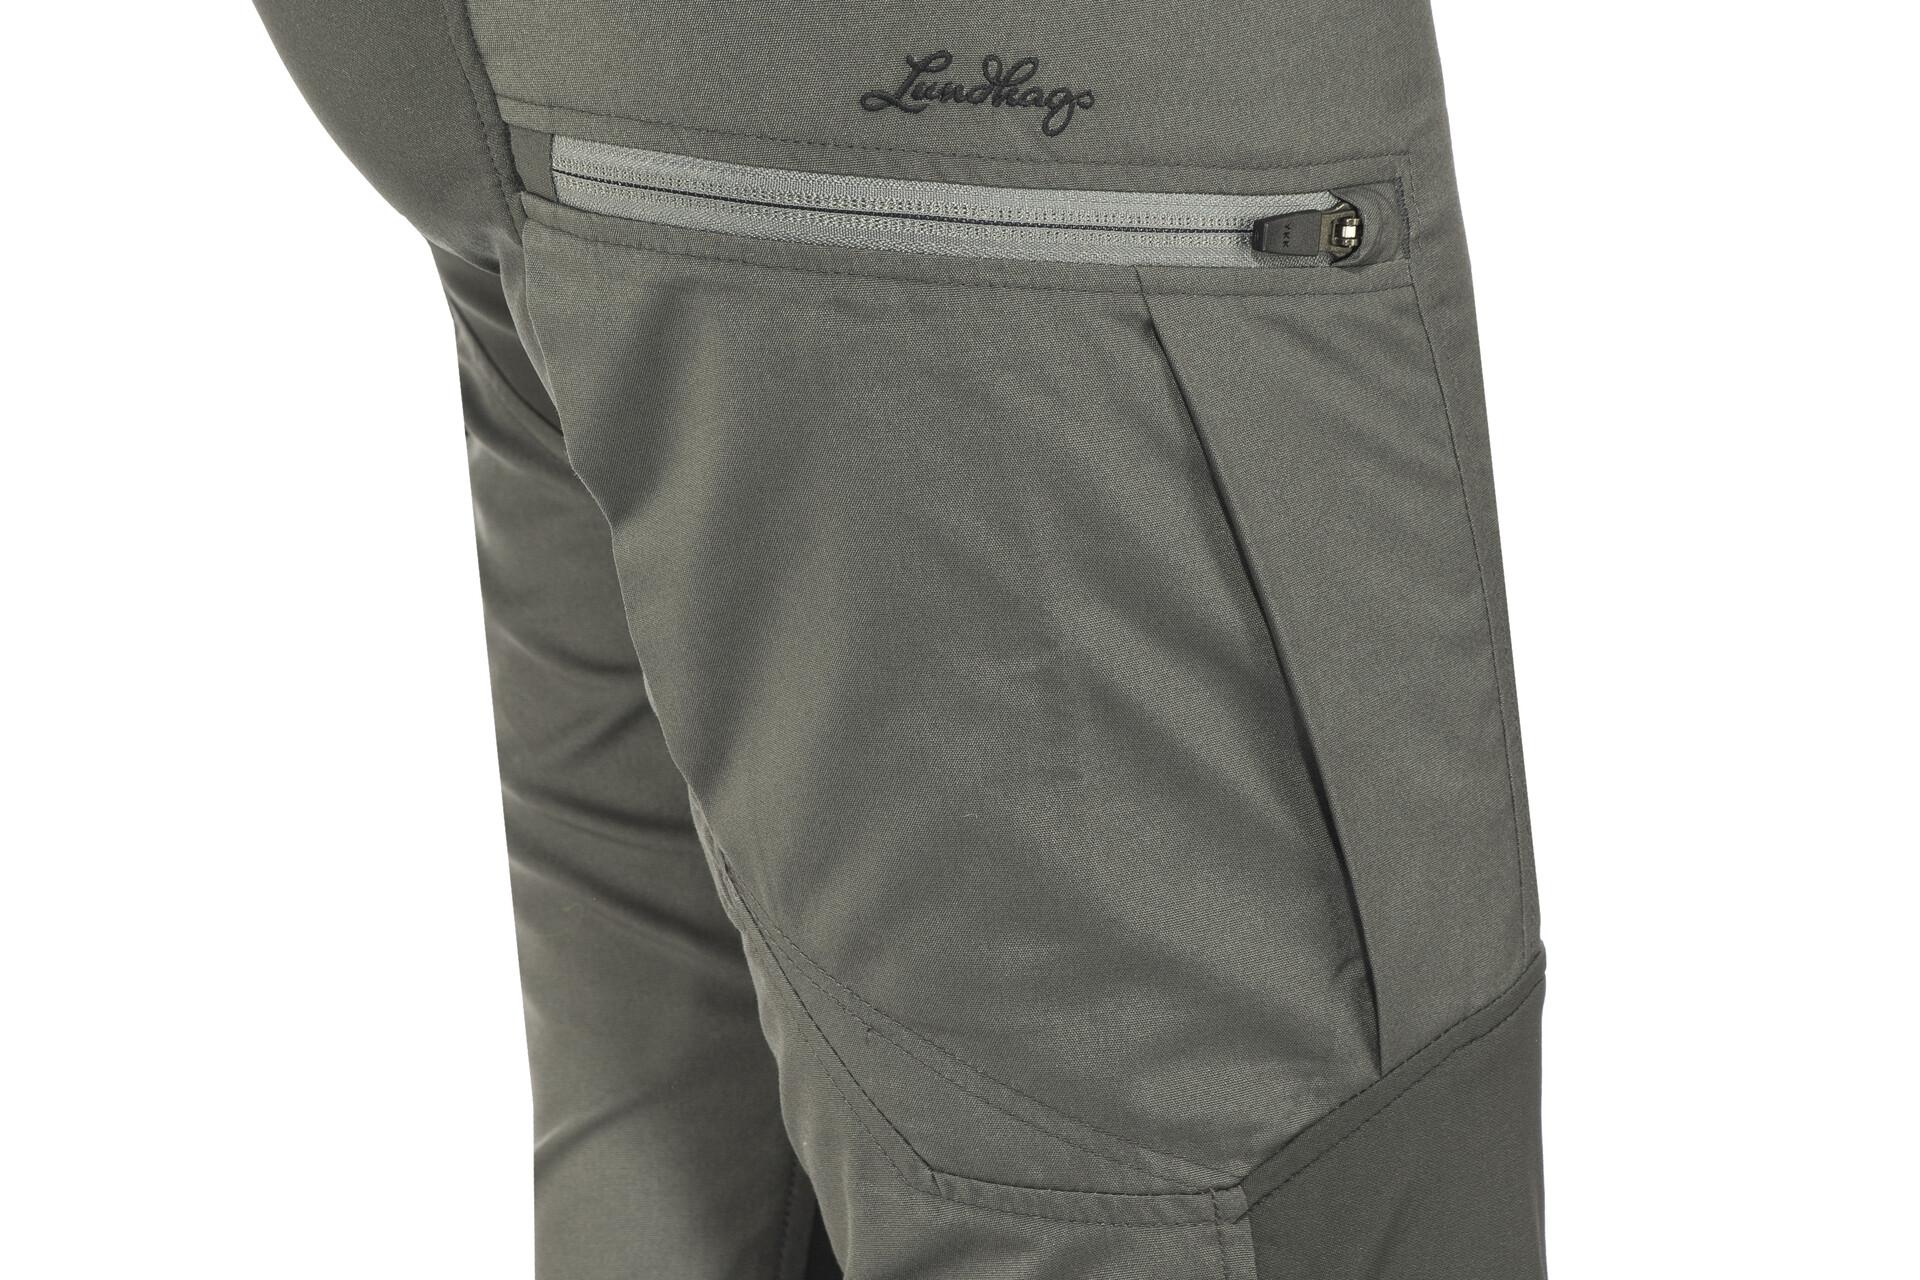 Lundhags W's Makke Pants Pants Pants Regular Granite/Charcoal a6afee